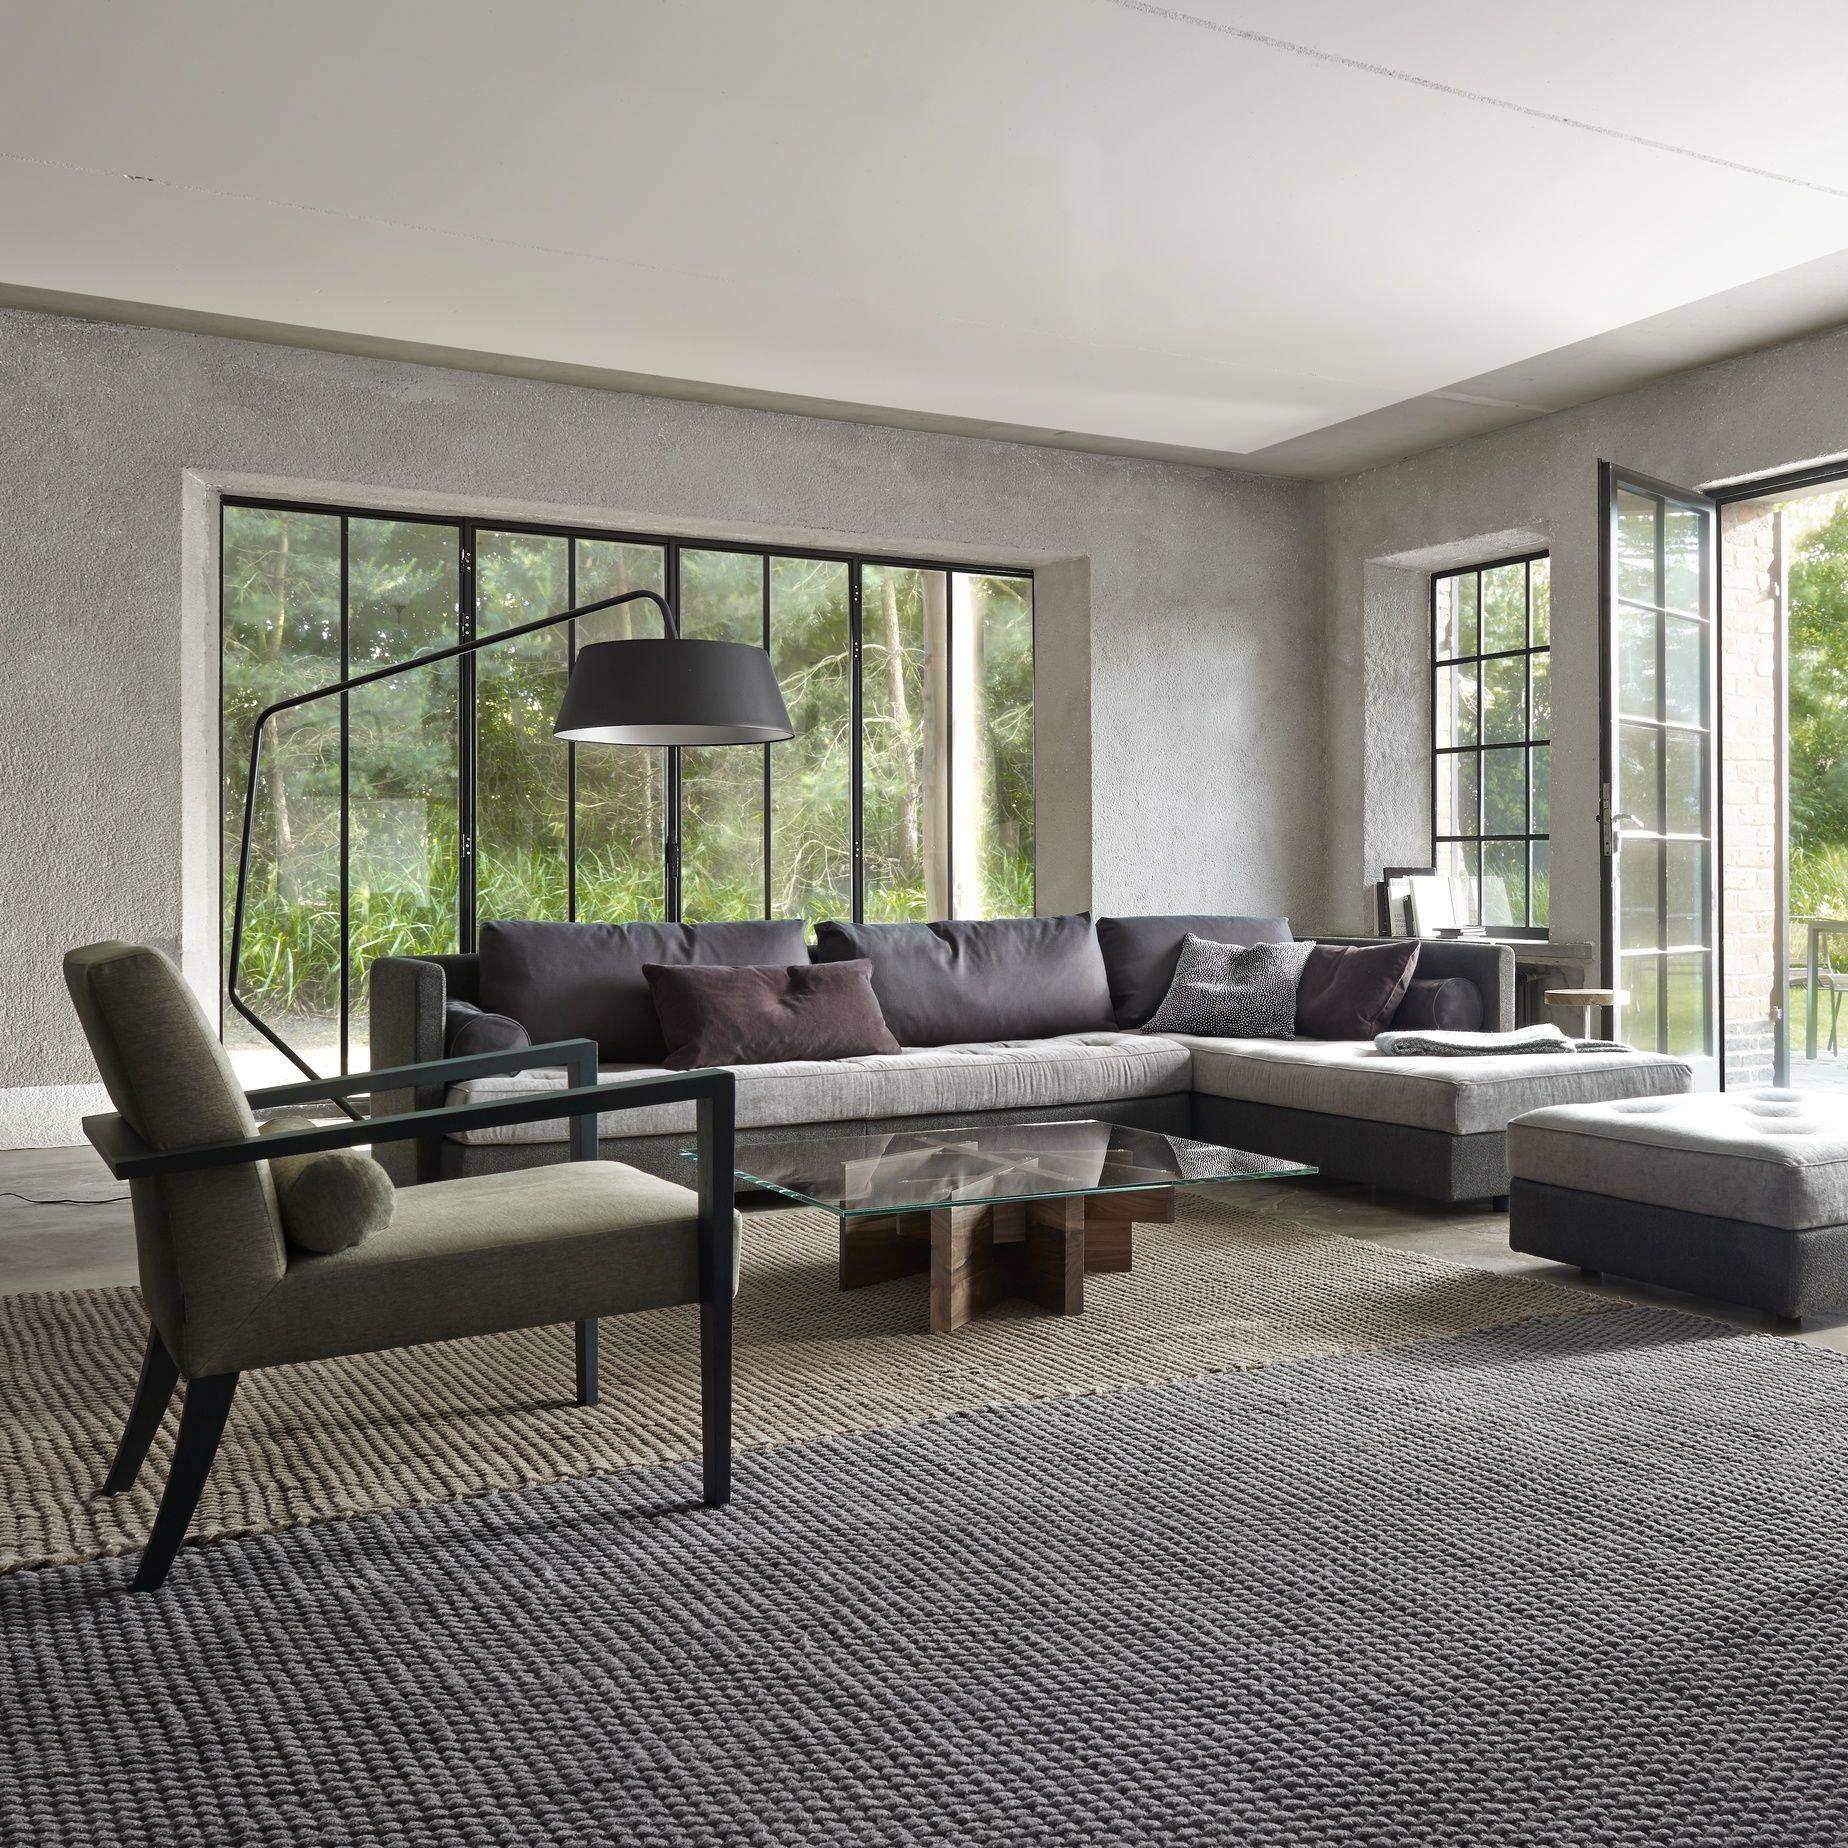 FRENCH LINE Armchairs Designer Di r Gomez